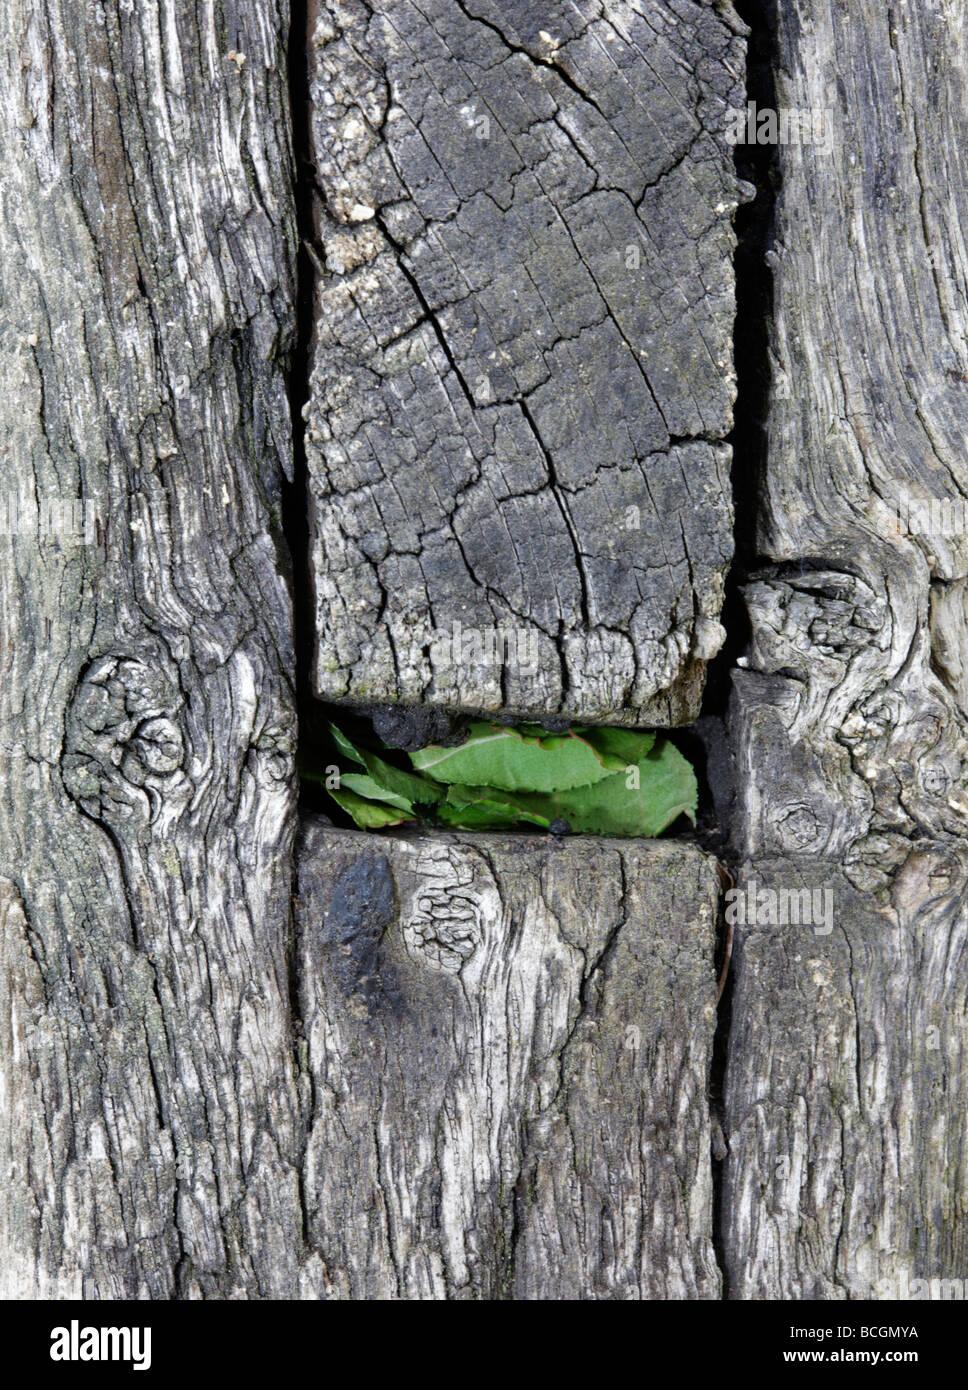 Megachile Centuncularis Blatt Fräser versiegelten Bienennest Stockbild